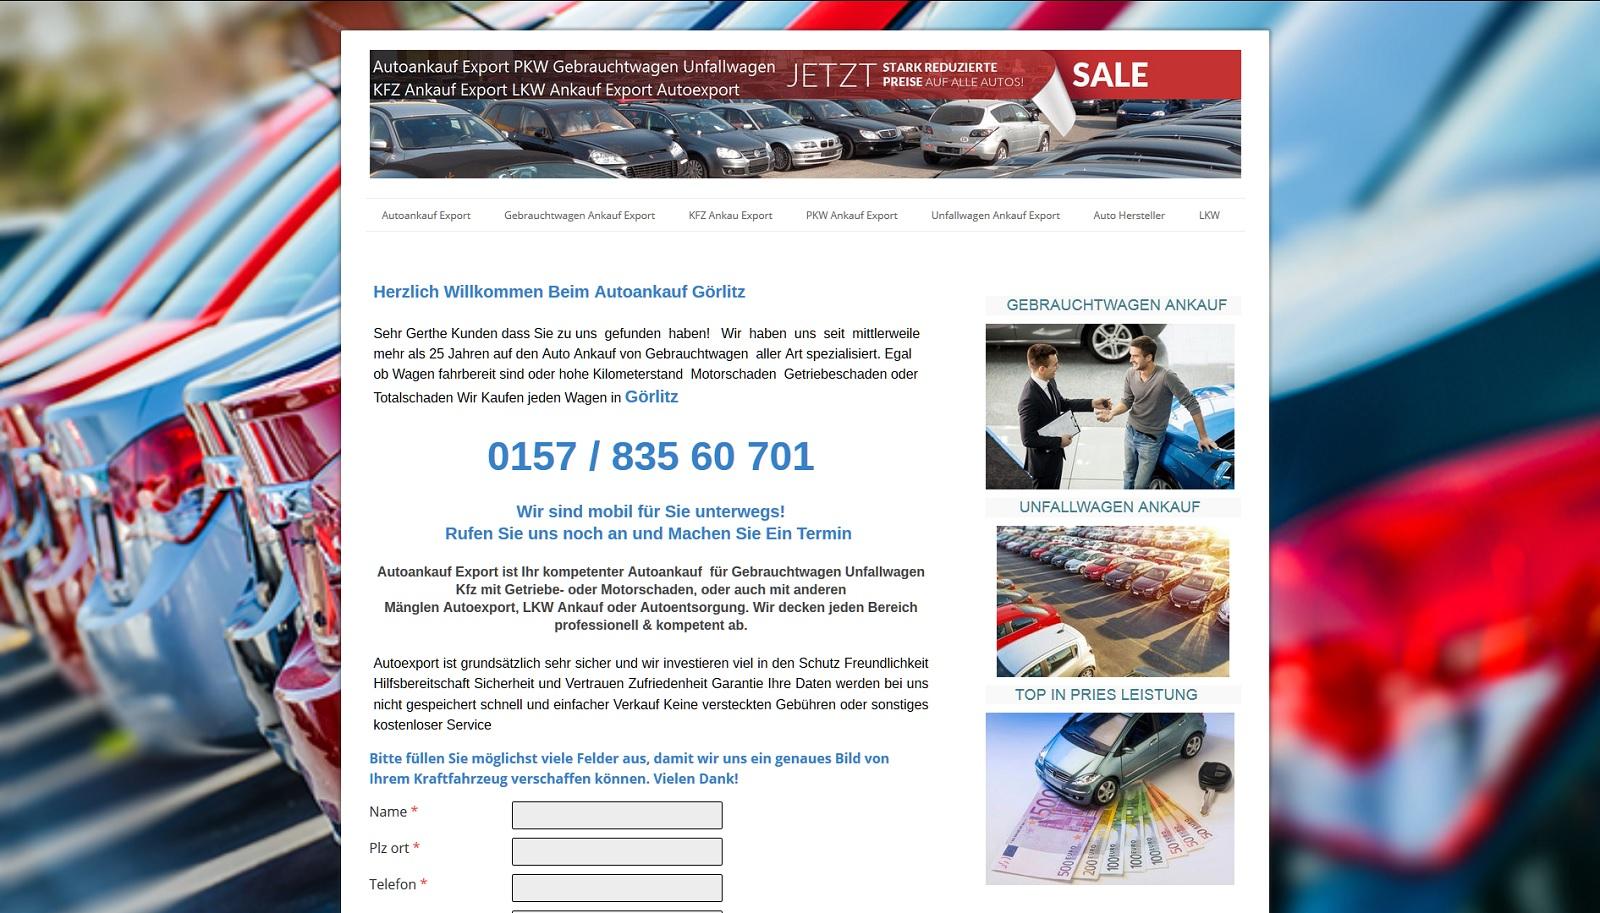 auto-ankauf-export.de - Autoankauf Goslar